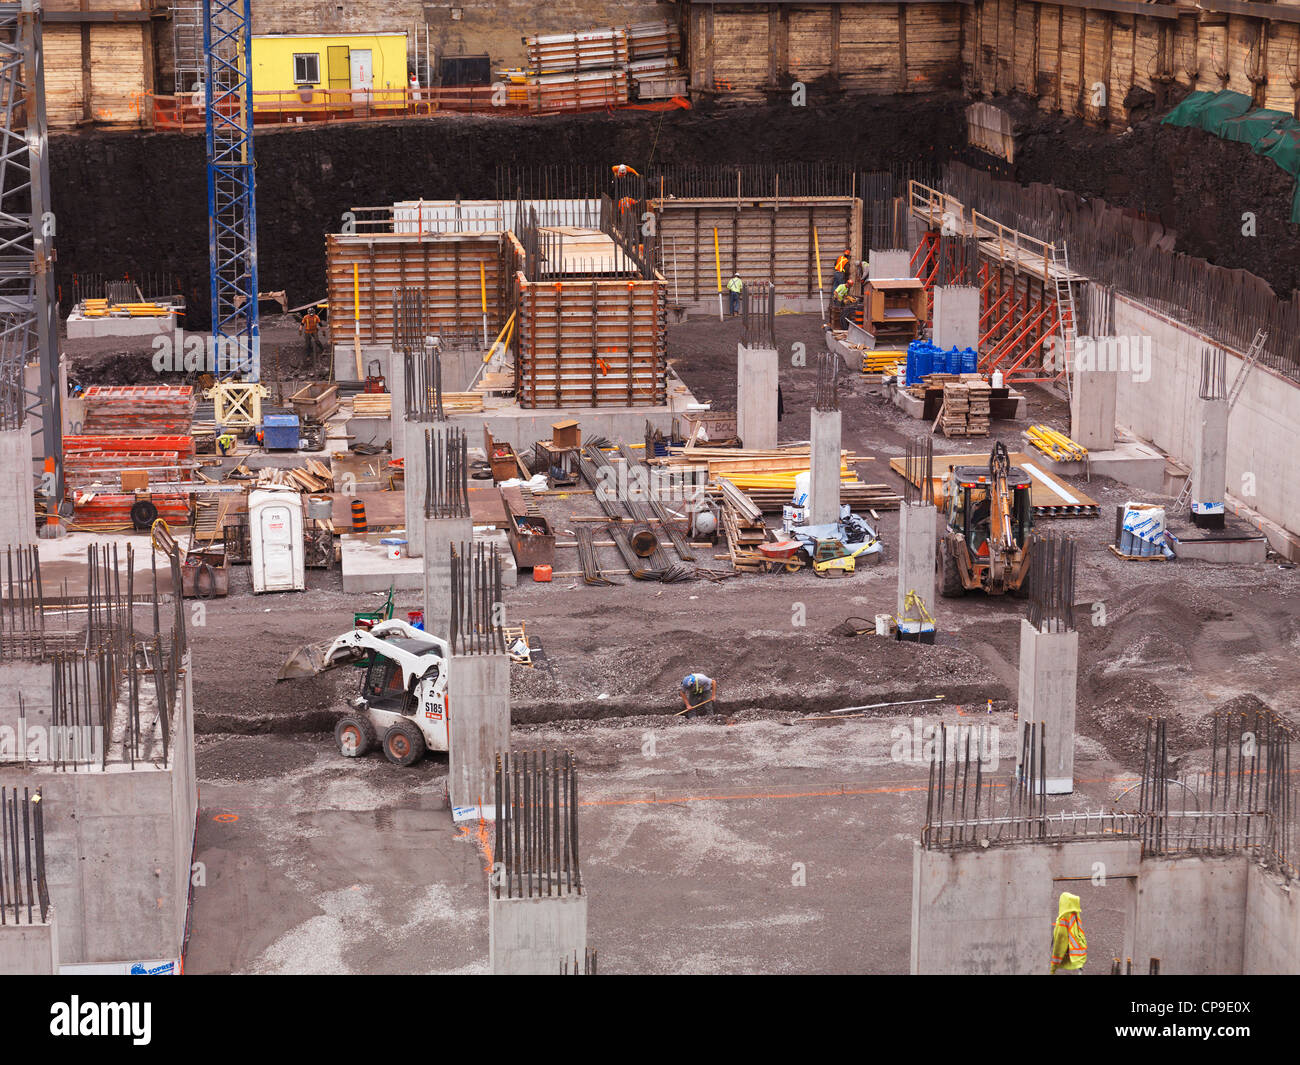 Construction site, building foundation pit. Ottawa, Ontario, Canada. - Stock Image